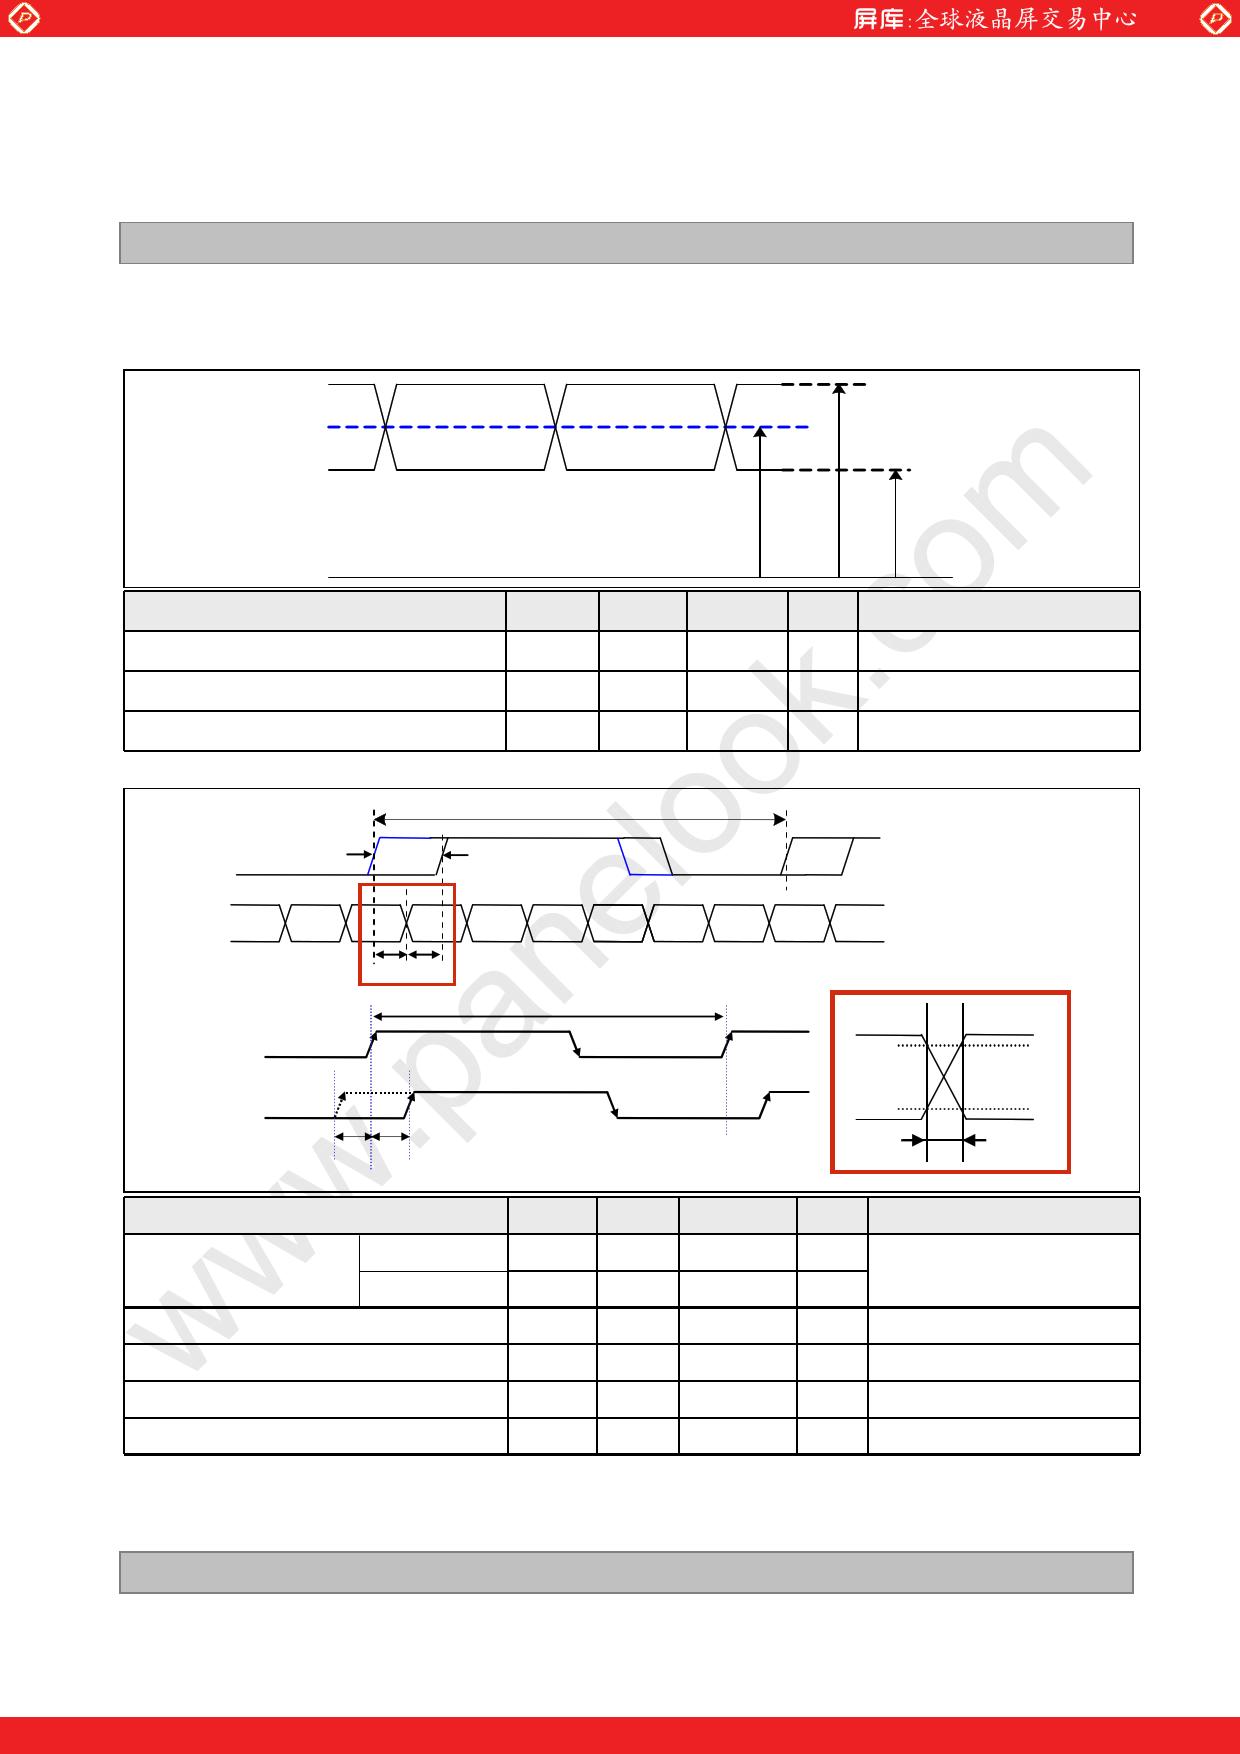 LC320EXJ-SEK1 arduino